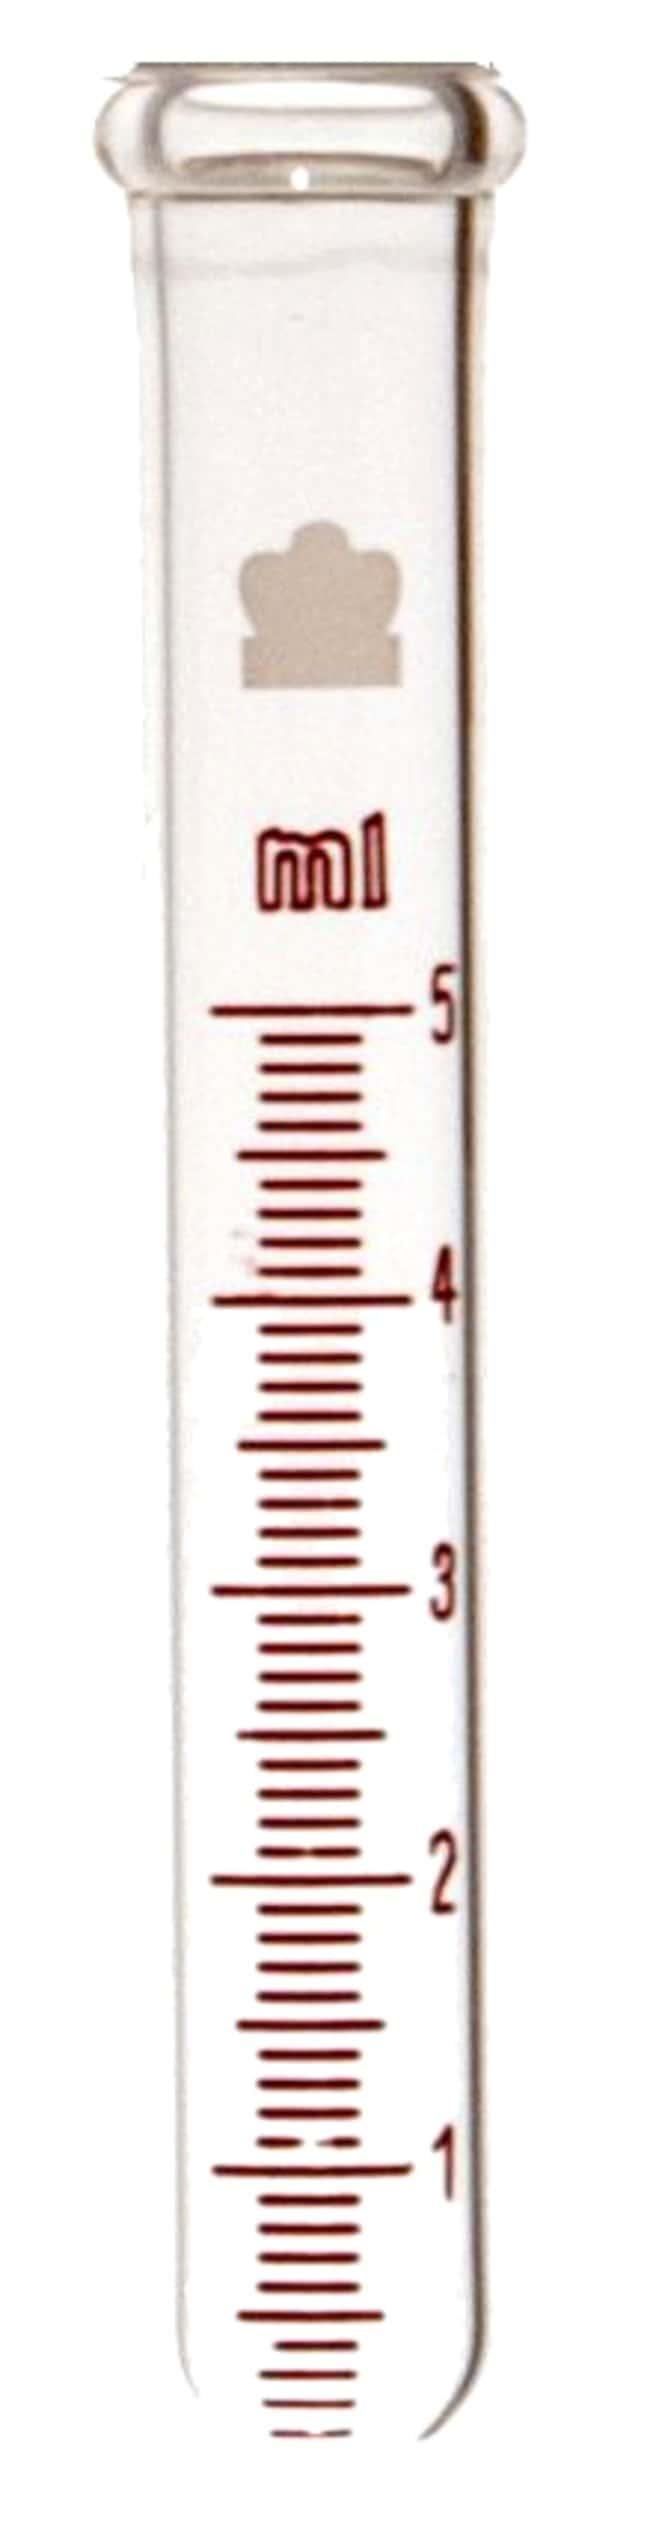 DWK Life SciencesKimble Kontes Graduated Test Tubes Capacity: 0.84 oz.